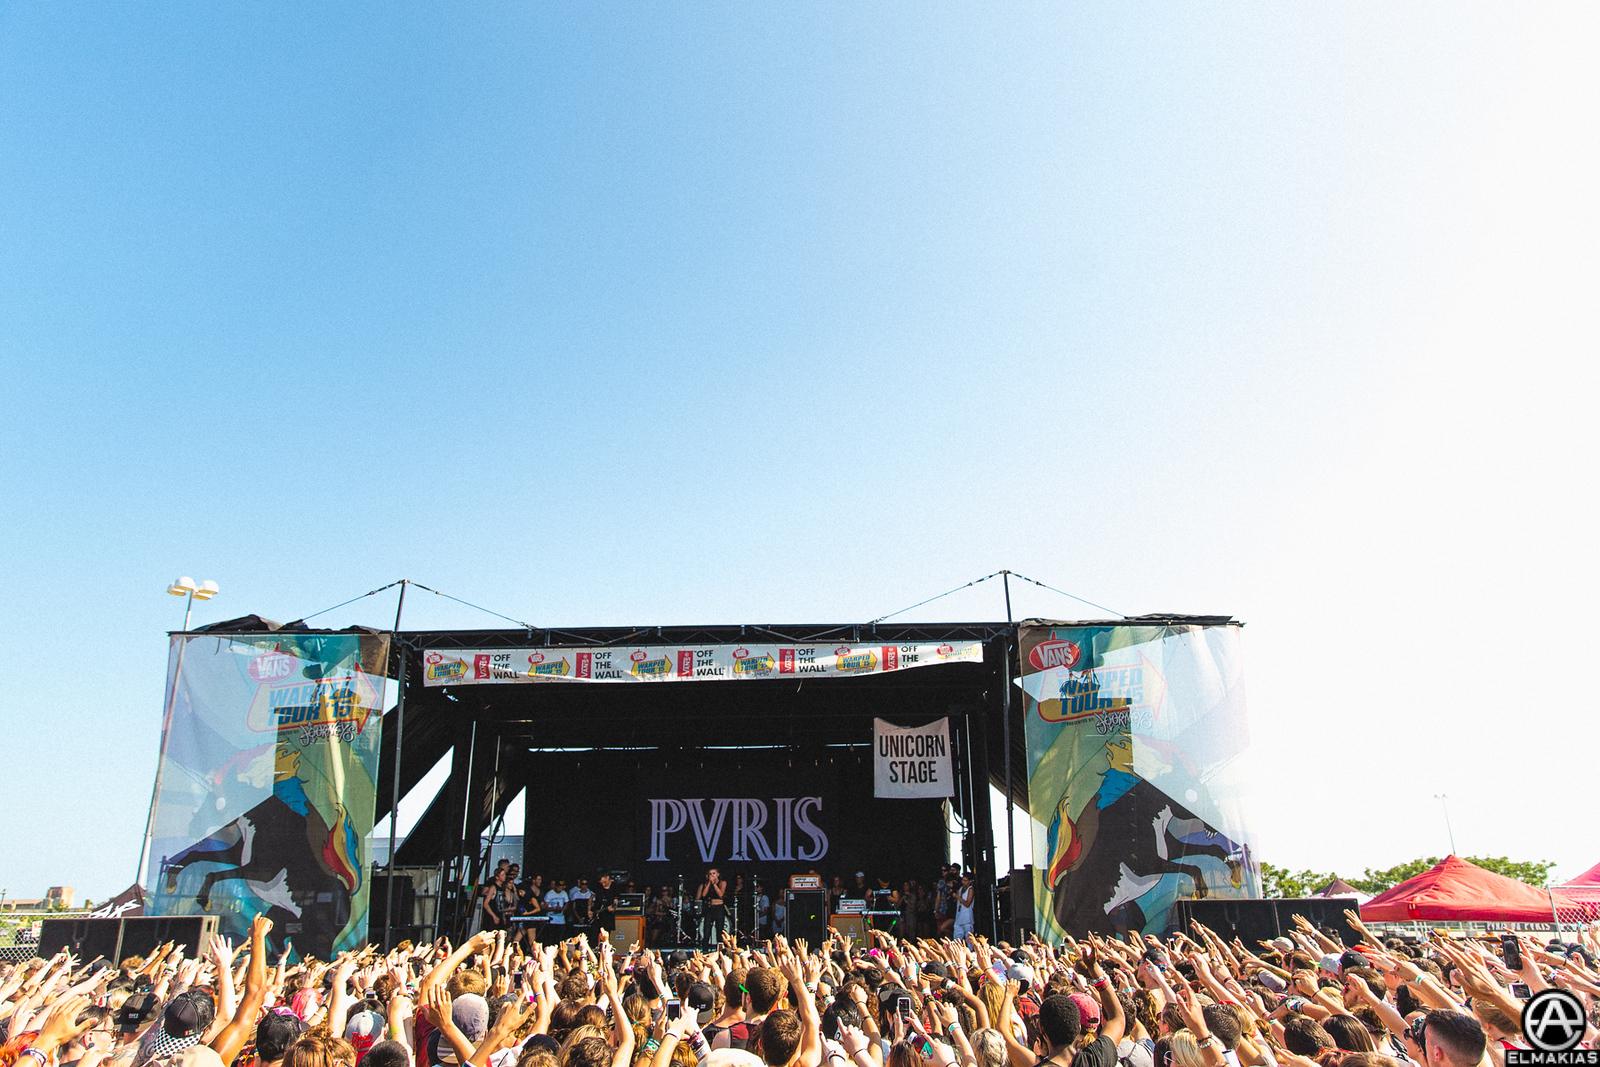 PVRIS live at Vans Warped Tour 2015 by Adam Elmakias